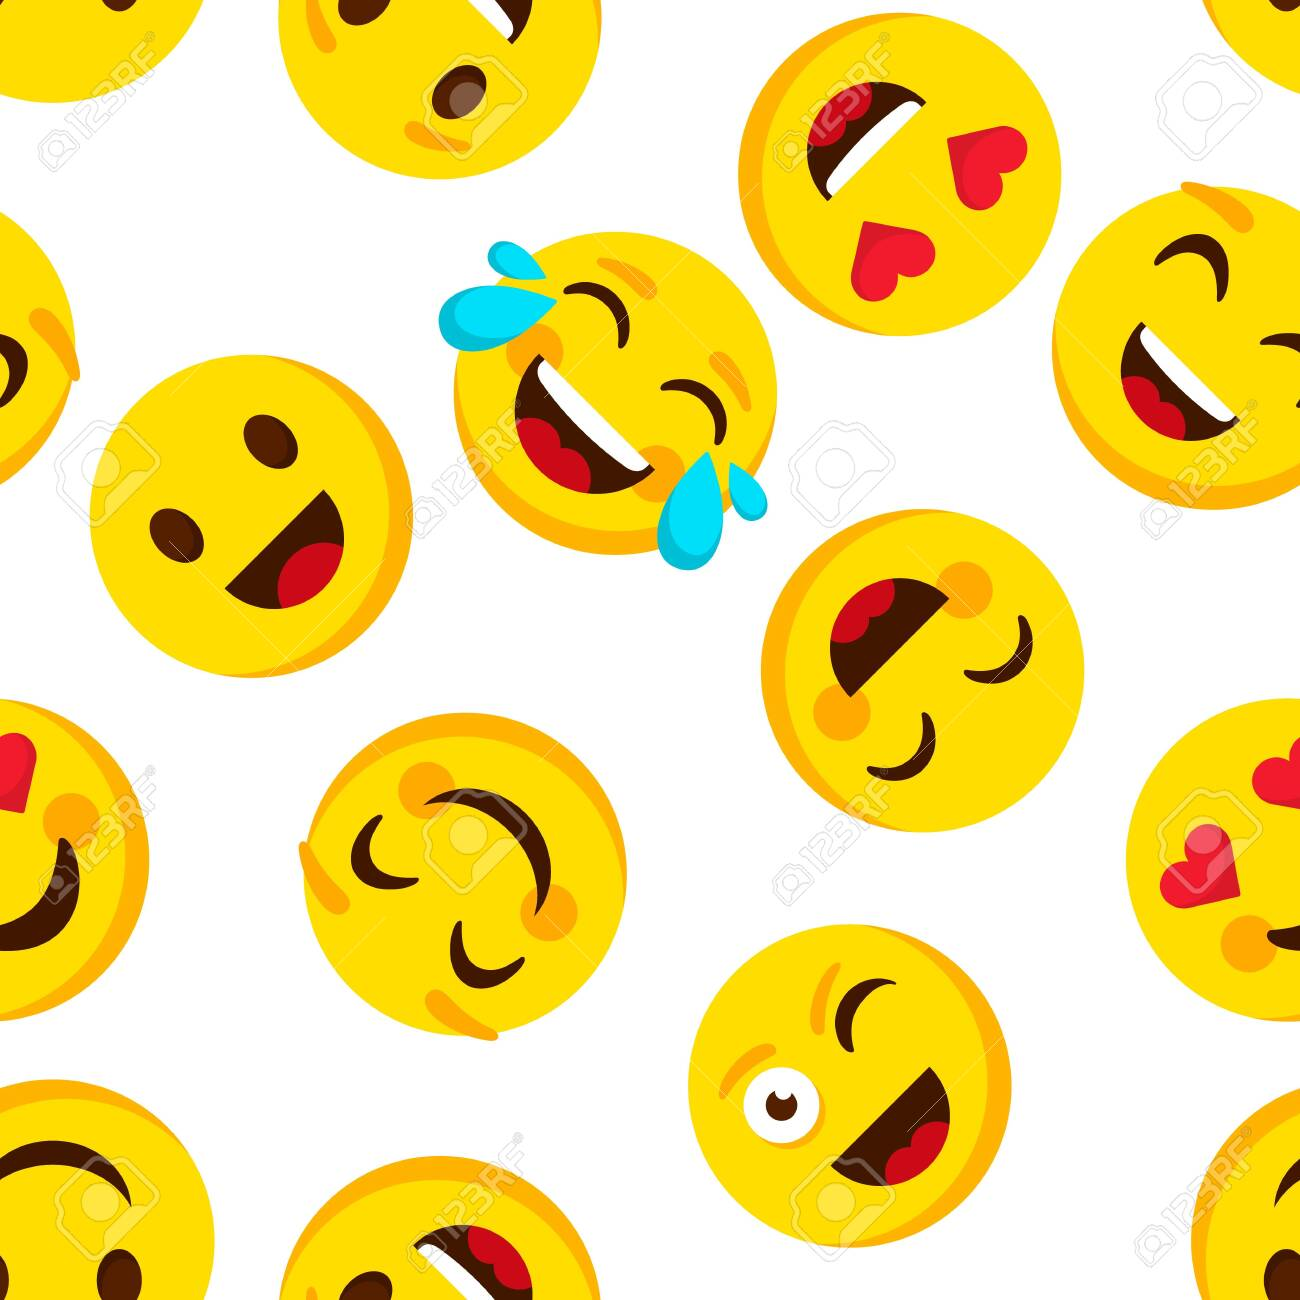 137874215 emoticon seamless pattern emotions cartoon emojis background funny cute faces cartoon kid vector wal